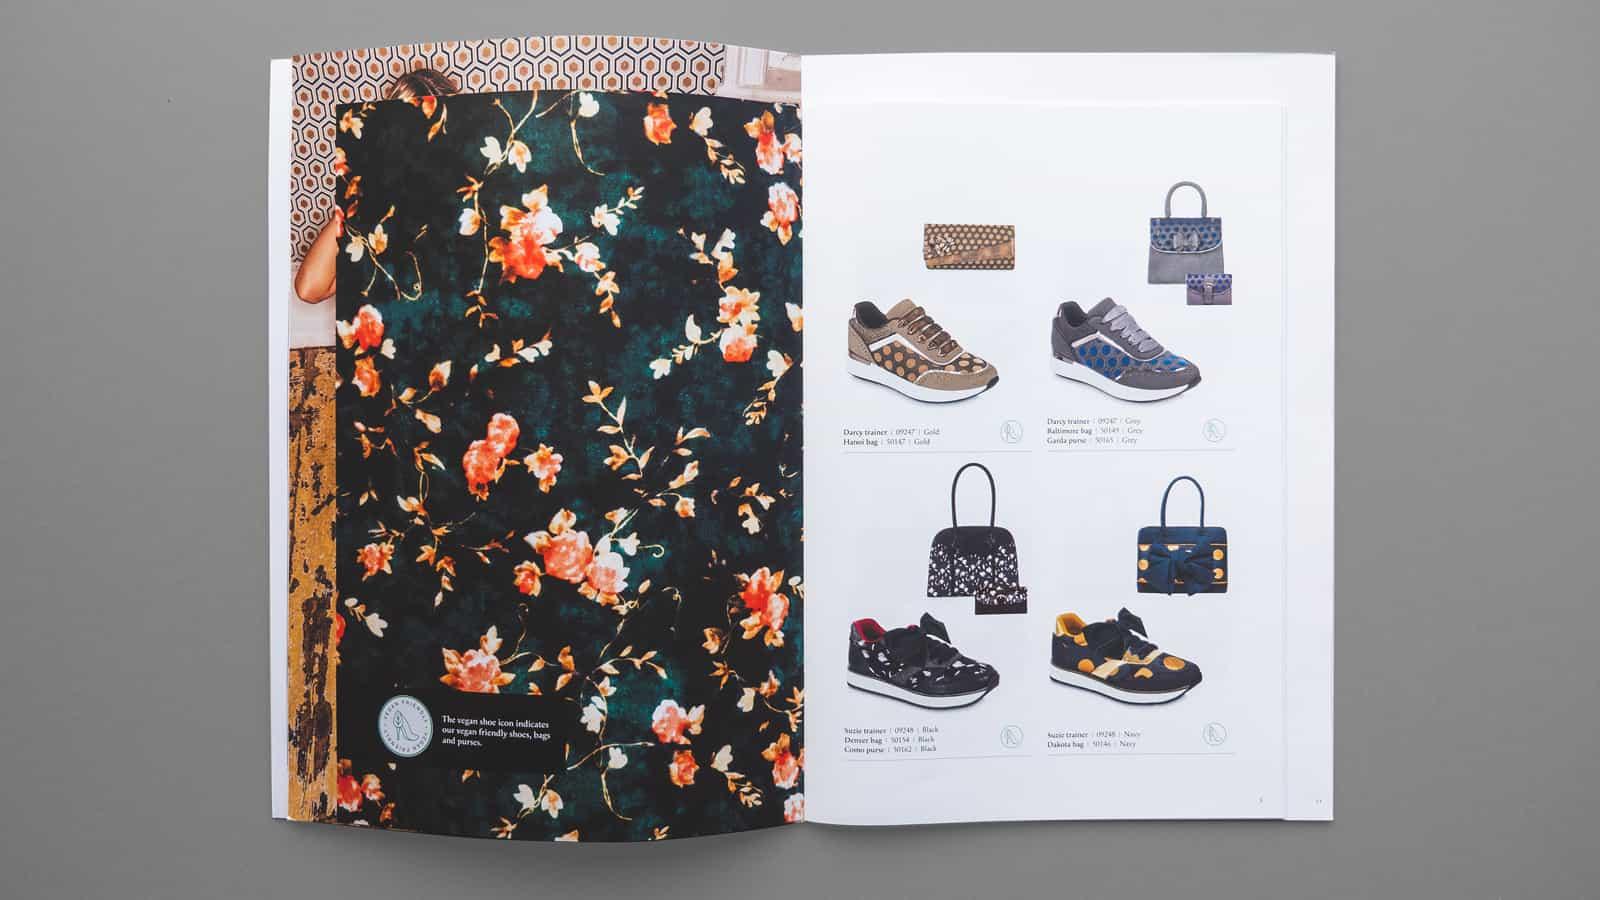 footwear-shoe-fashion-branding-look-book-marketing-design-milton-keynes-8